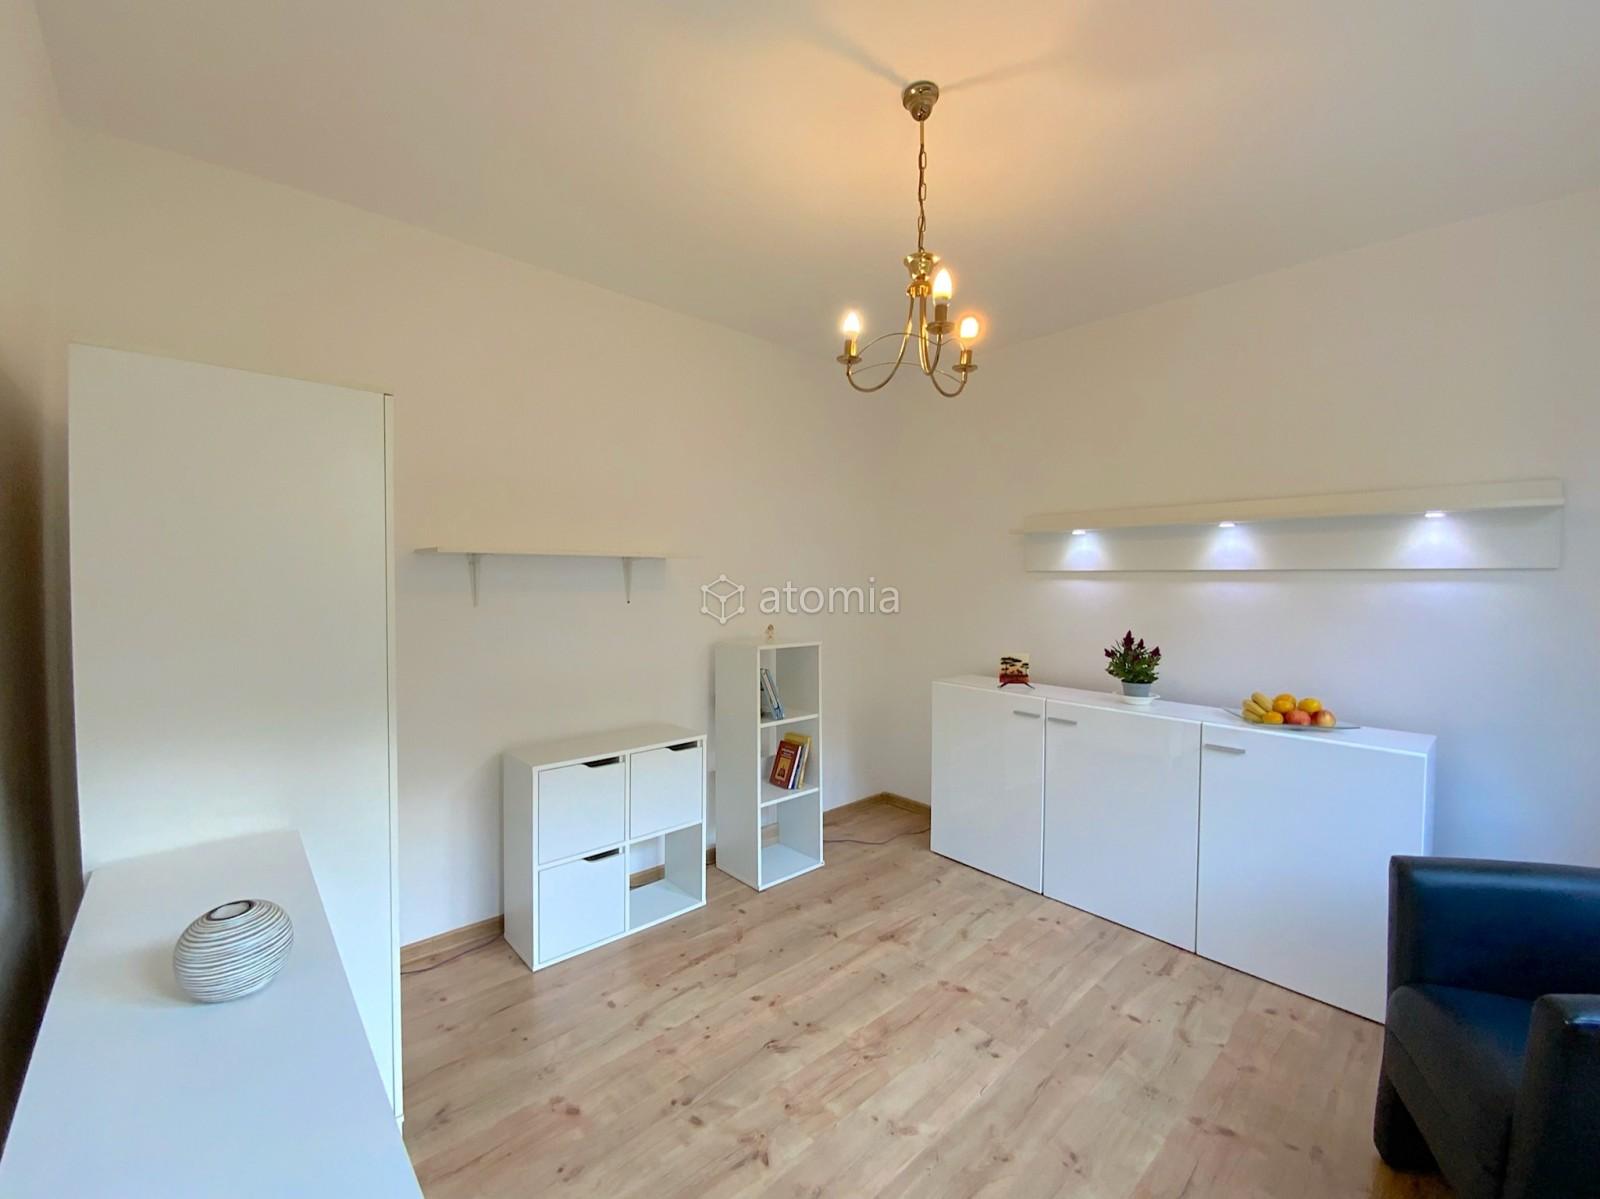 1 - izbový byt, 28 m2, 1.p./4.p.,  ticho, zeleň, blízkosť centra